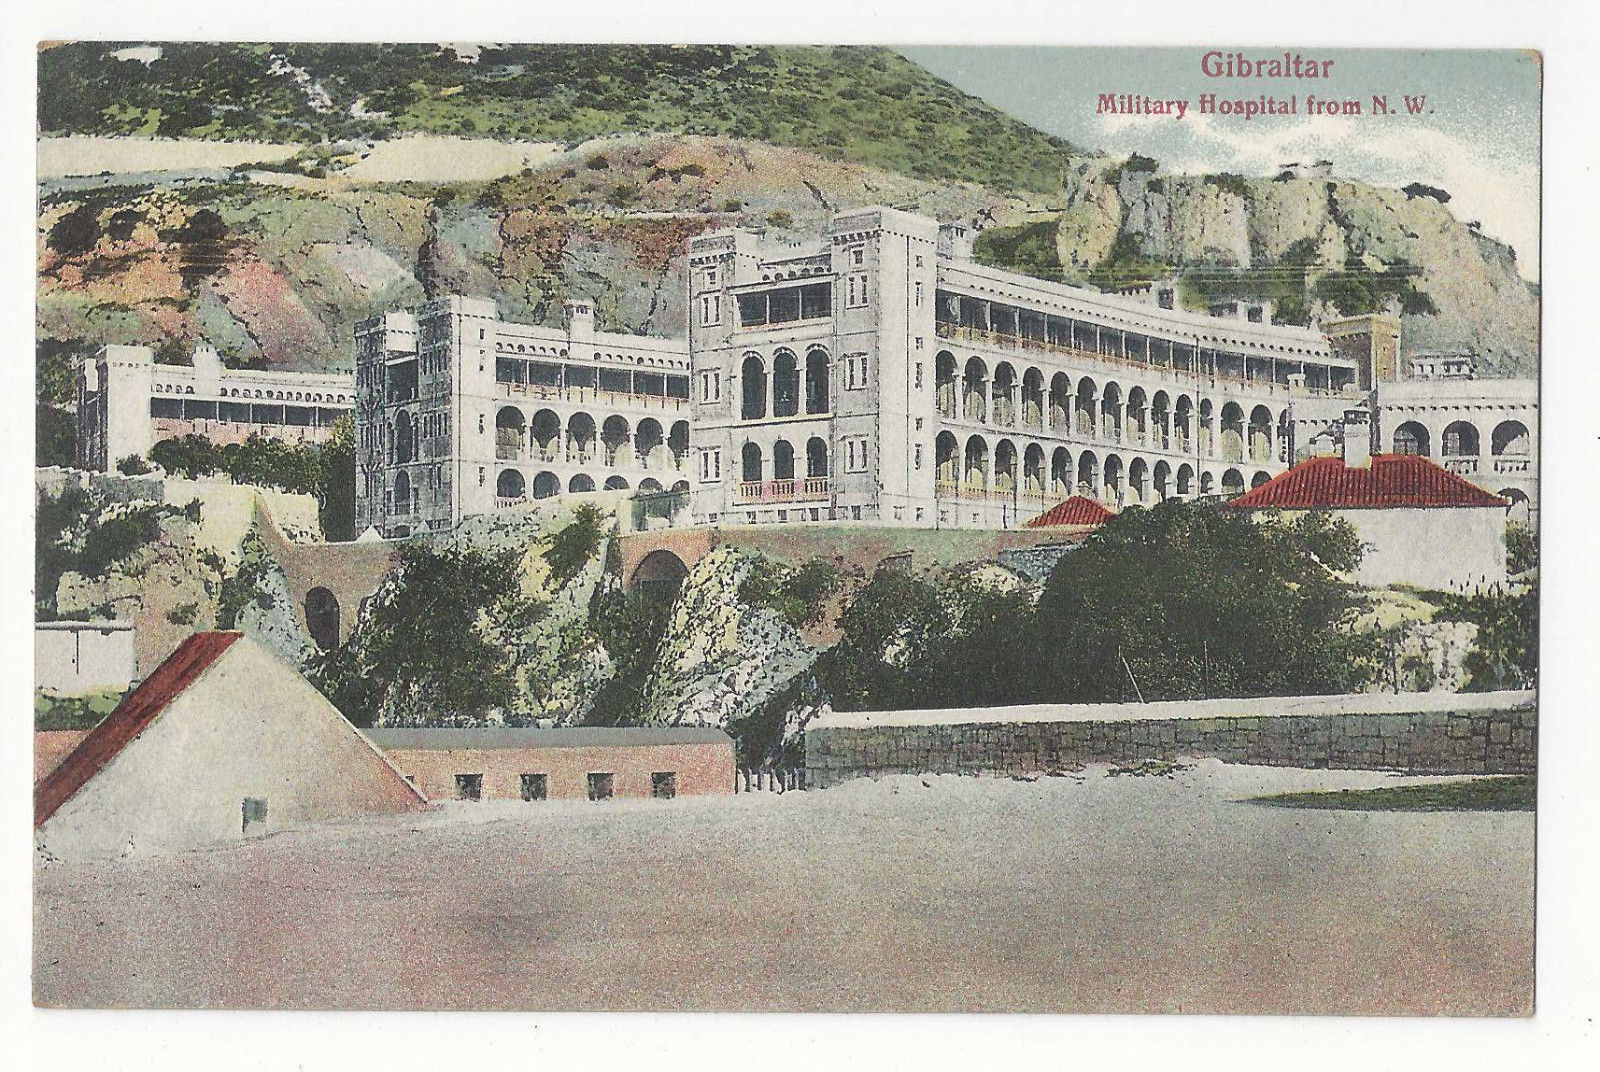 UK Gibraltar Military Hospital from NW Vintage VB Cumbo Postcard c 1910